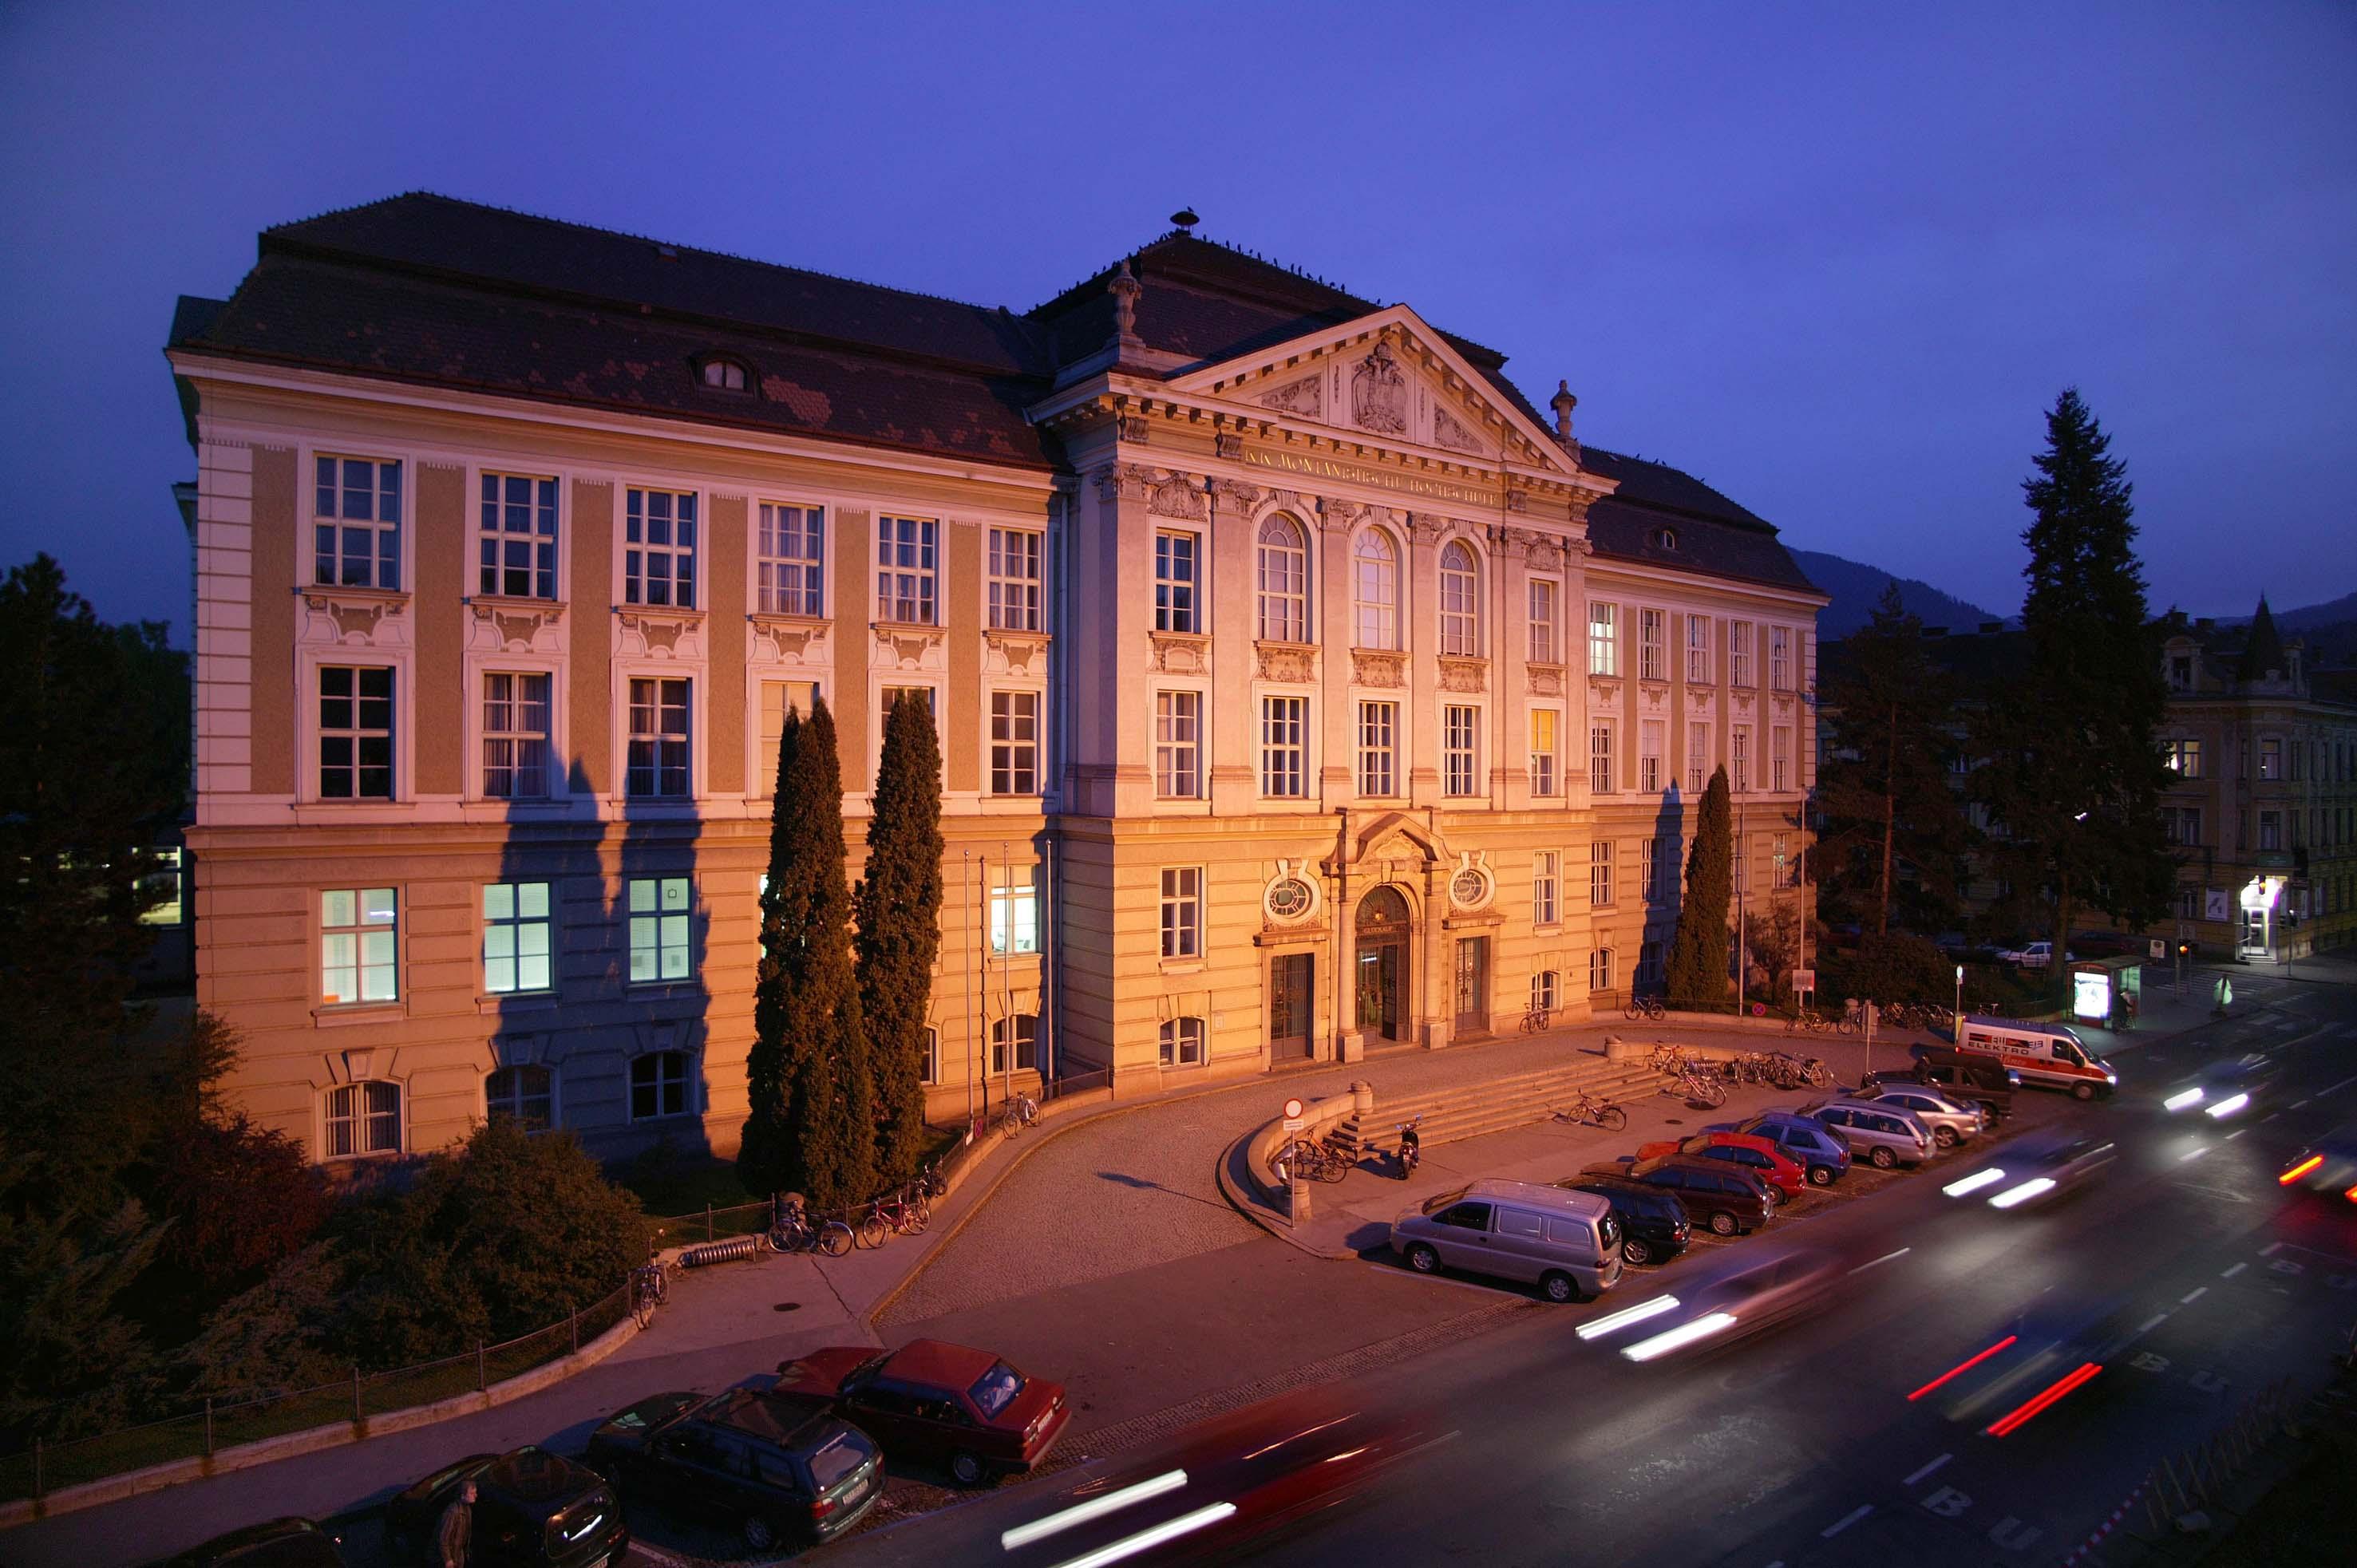 Main building of Montanuniversitaet Leoben at night.